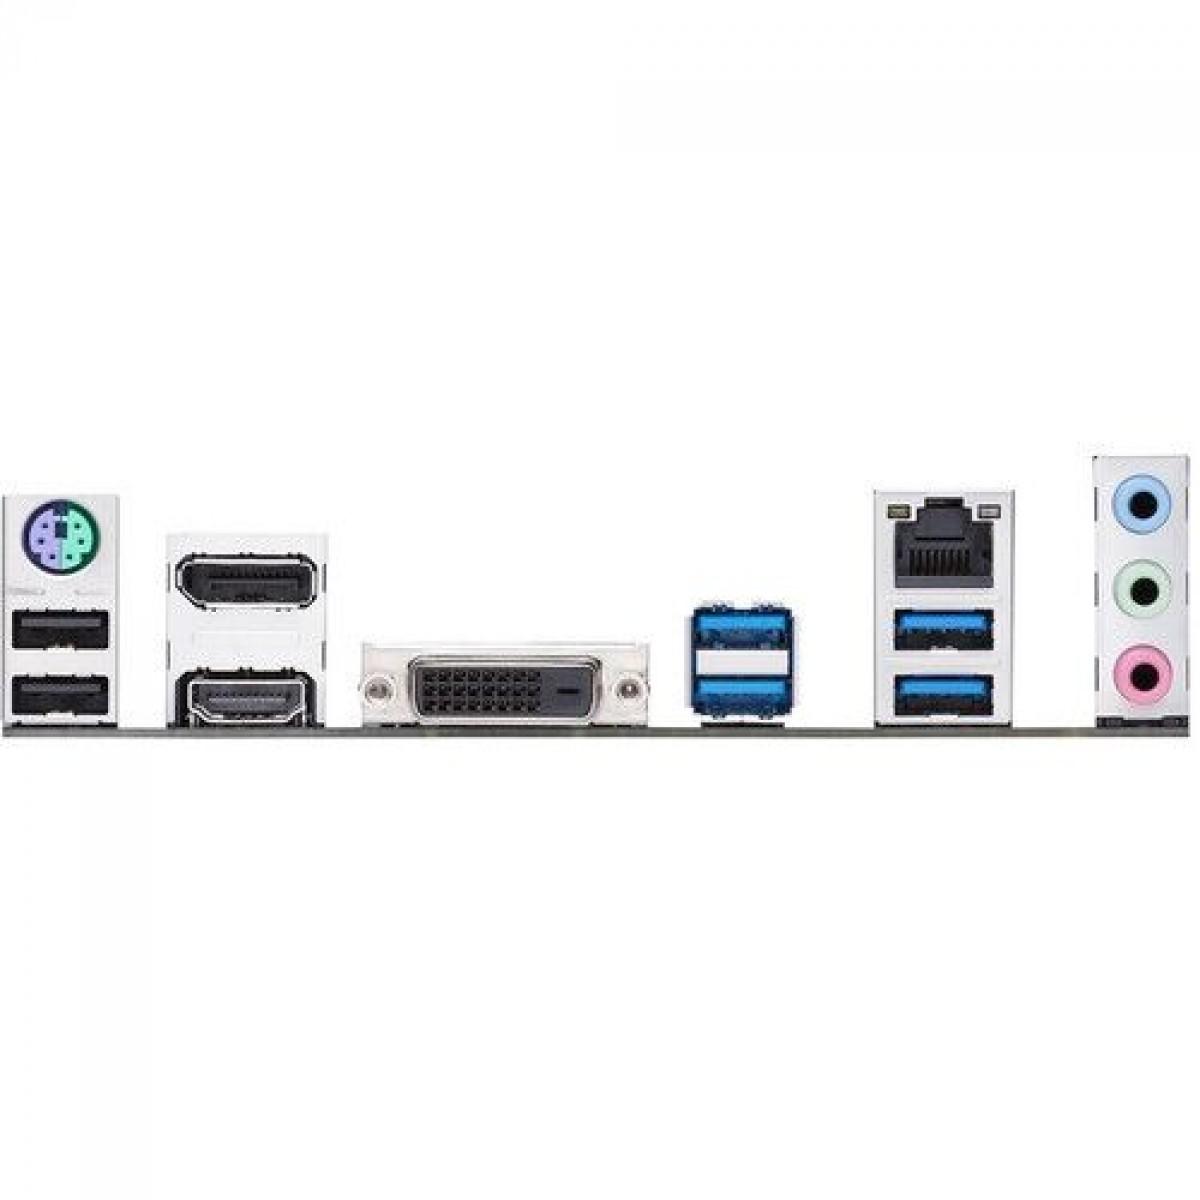 Placa Mãe Asus Prime B460M-A, Chipset B460, Intel LGA 1200, mATX, DDR4